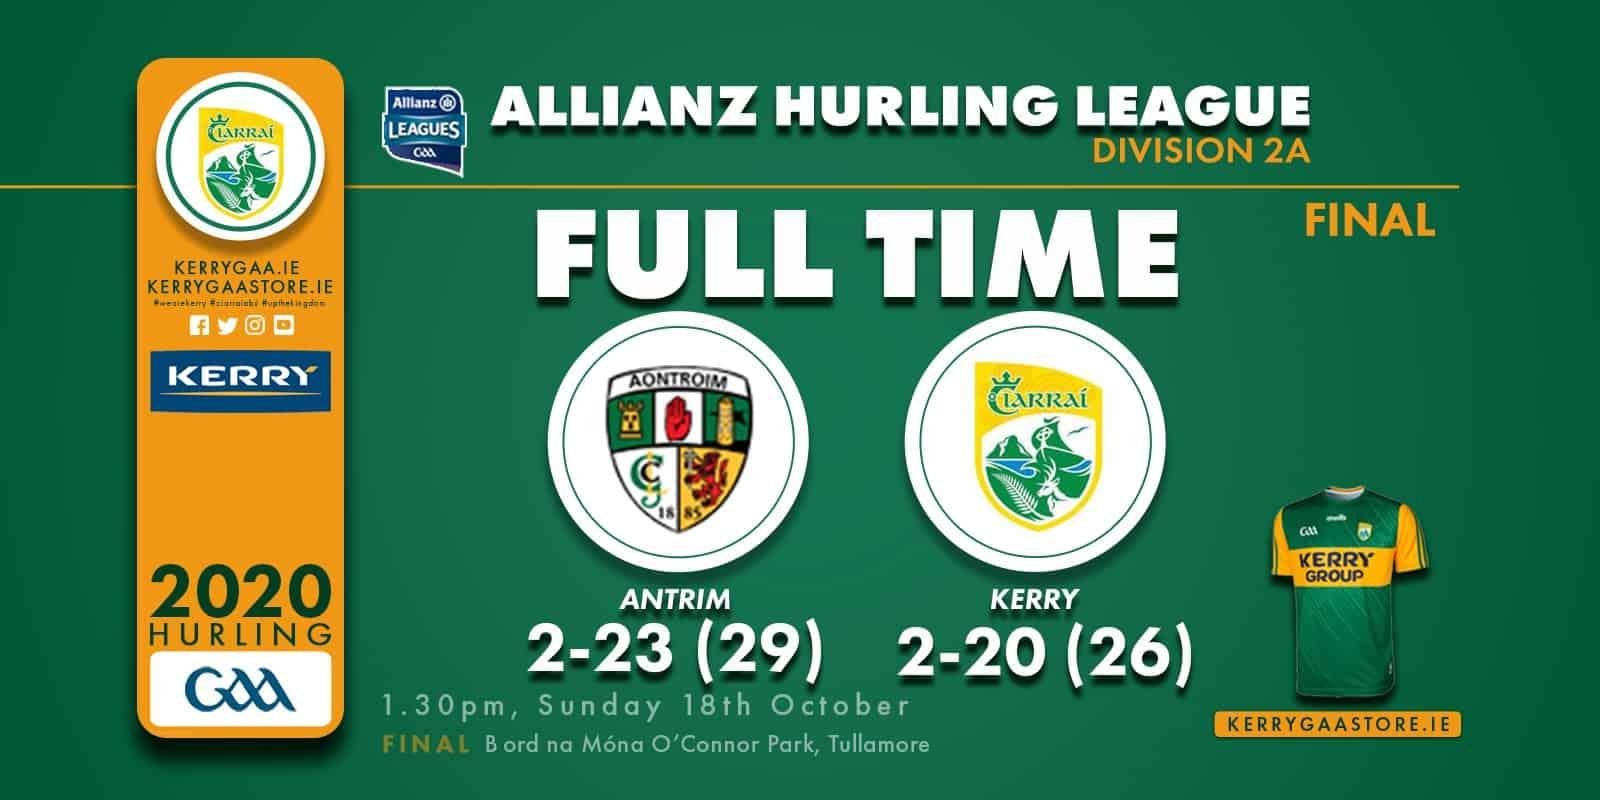 No Joy for Kerry Hurlers as Antrim win Div.2A